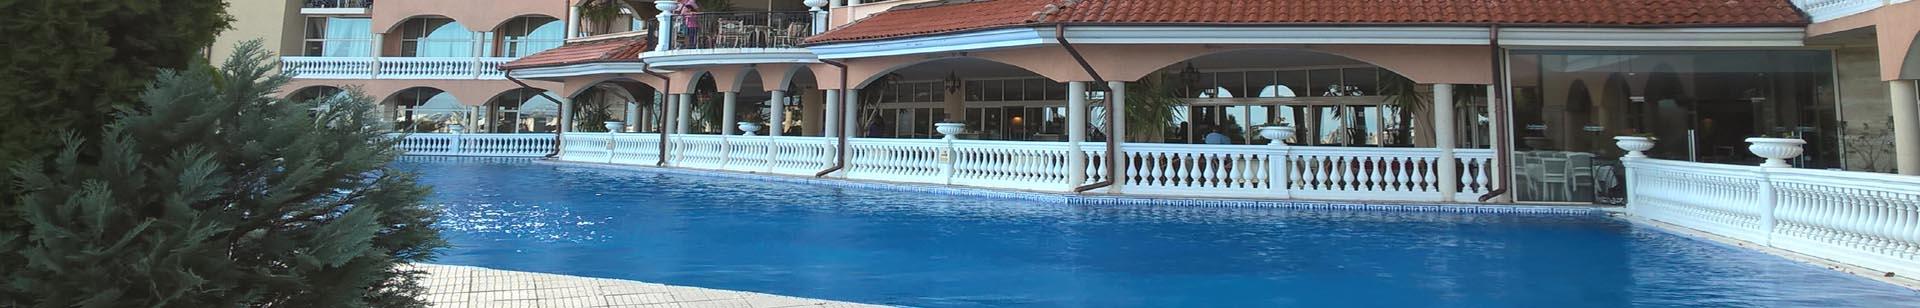 Bułgaria Hotel 1920x308